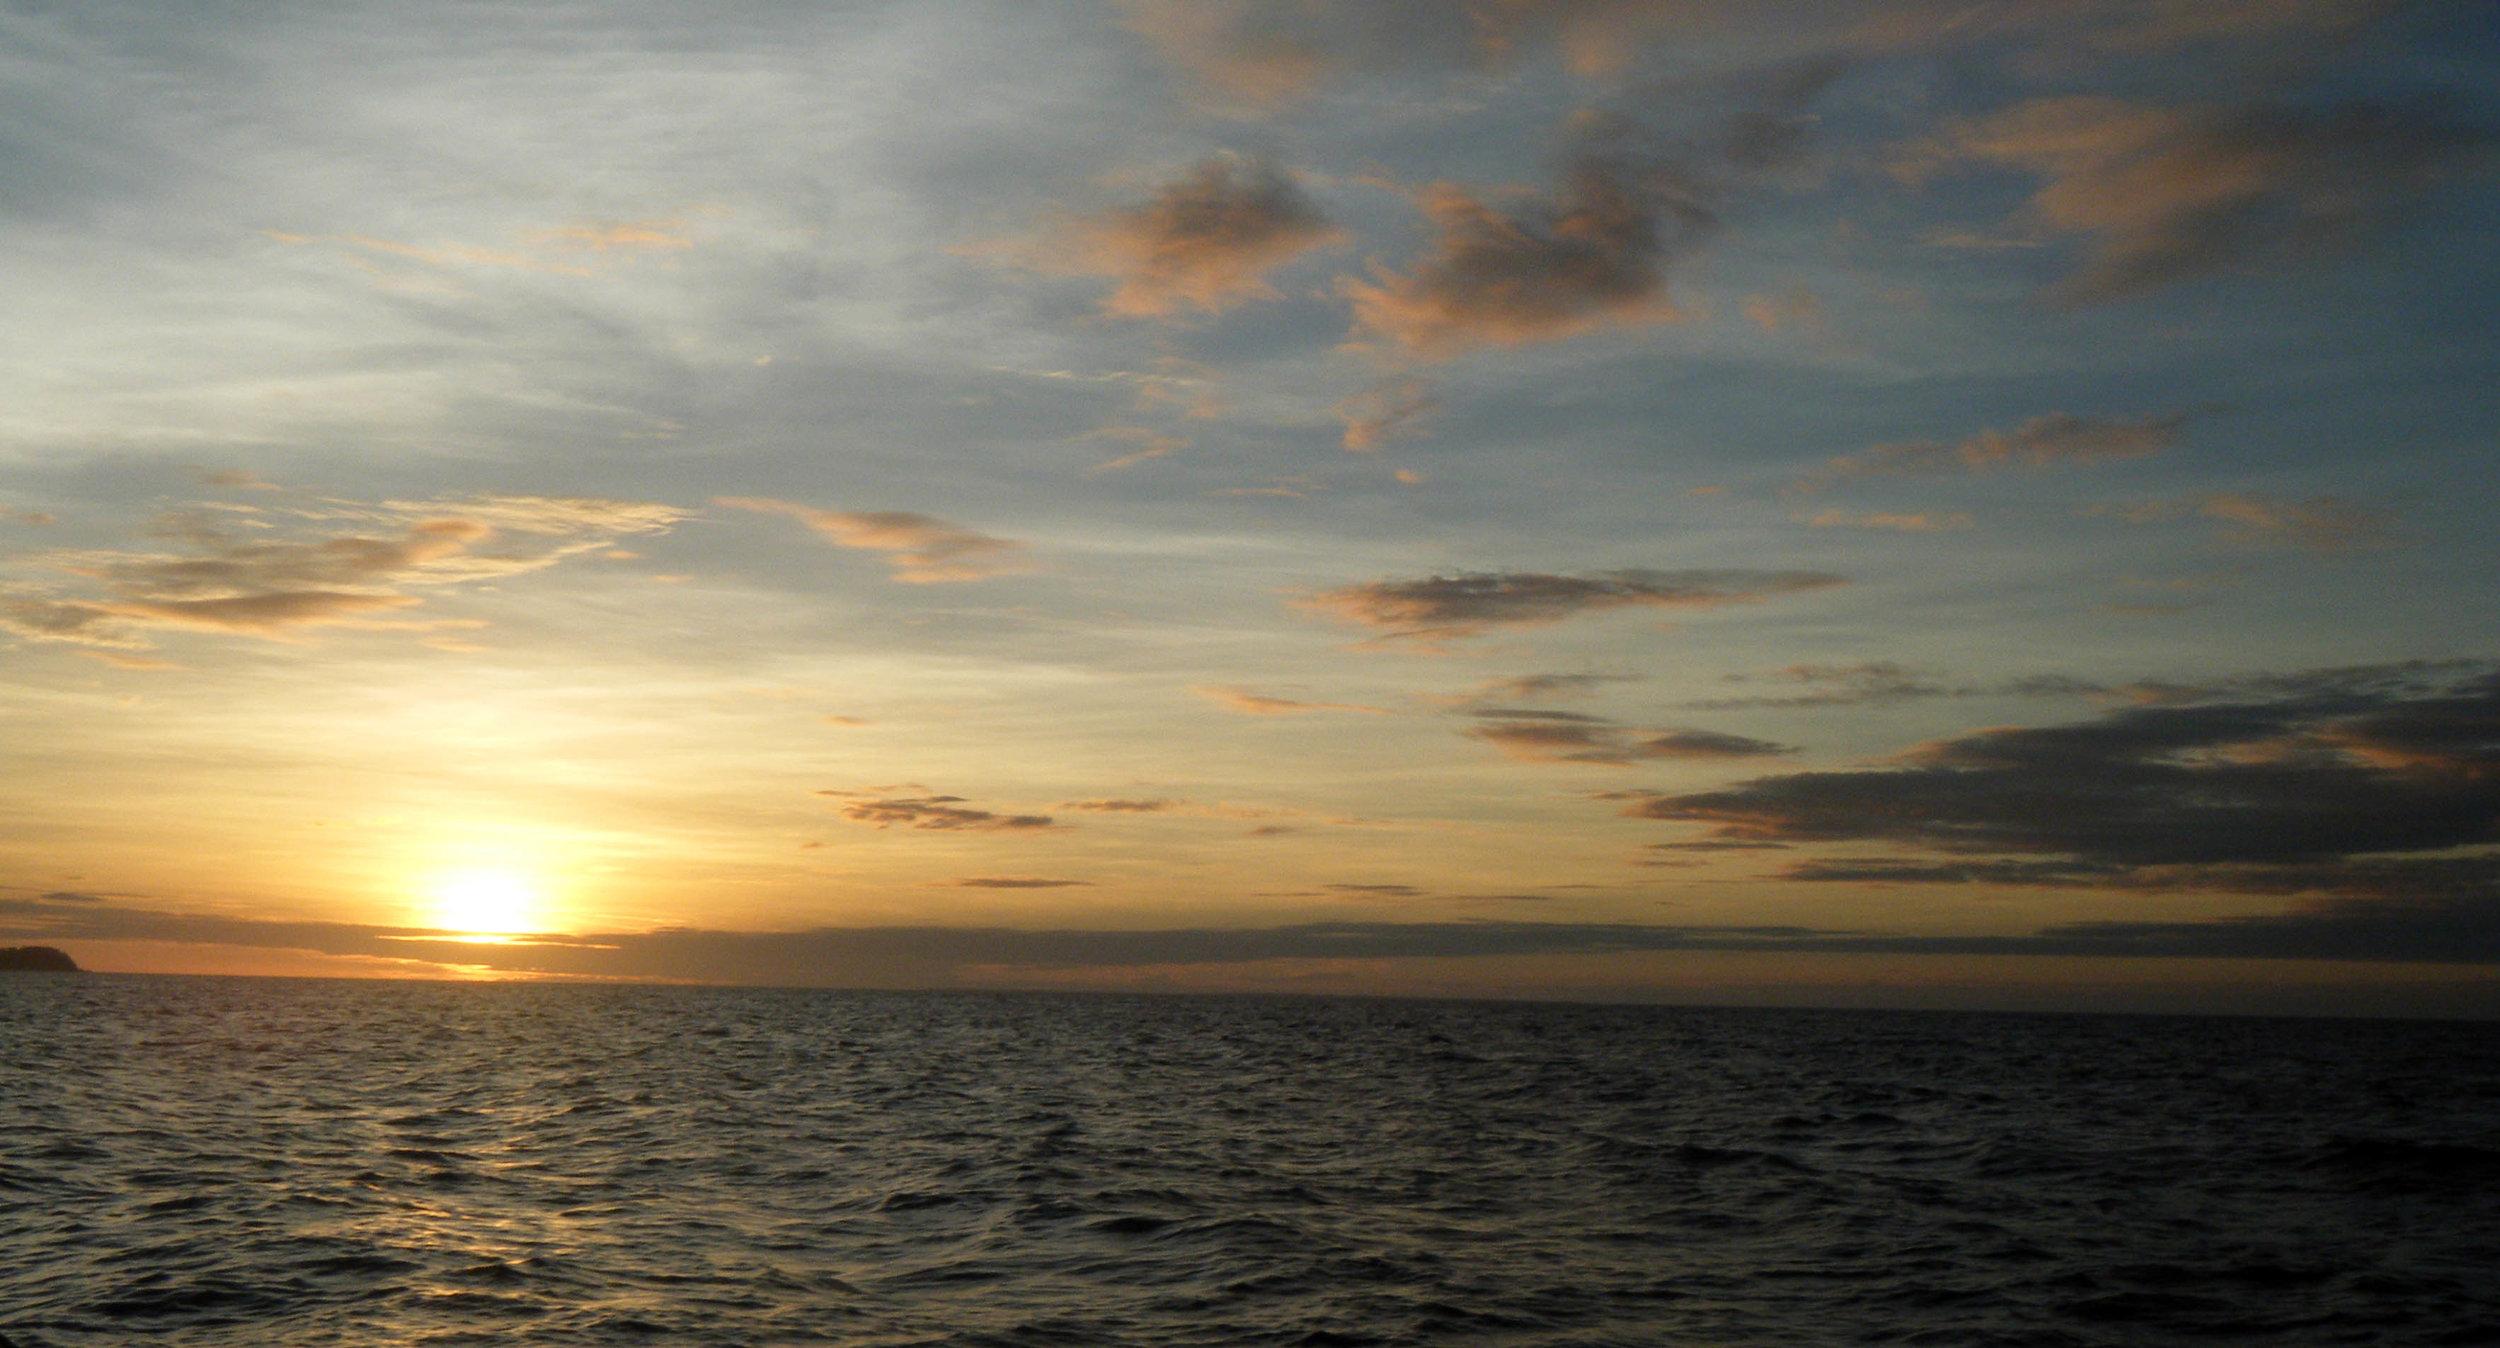 sunset 2-6-13.jpg